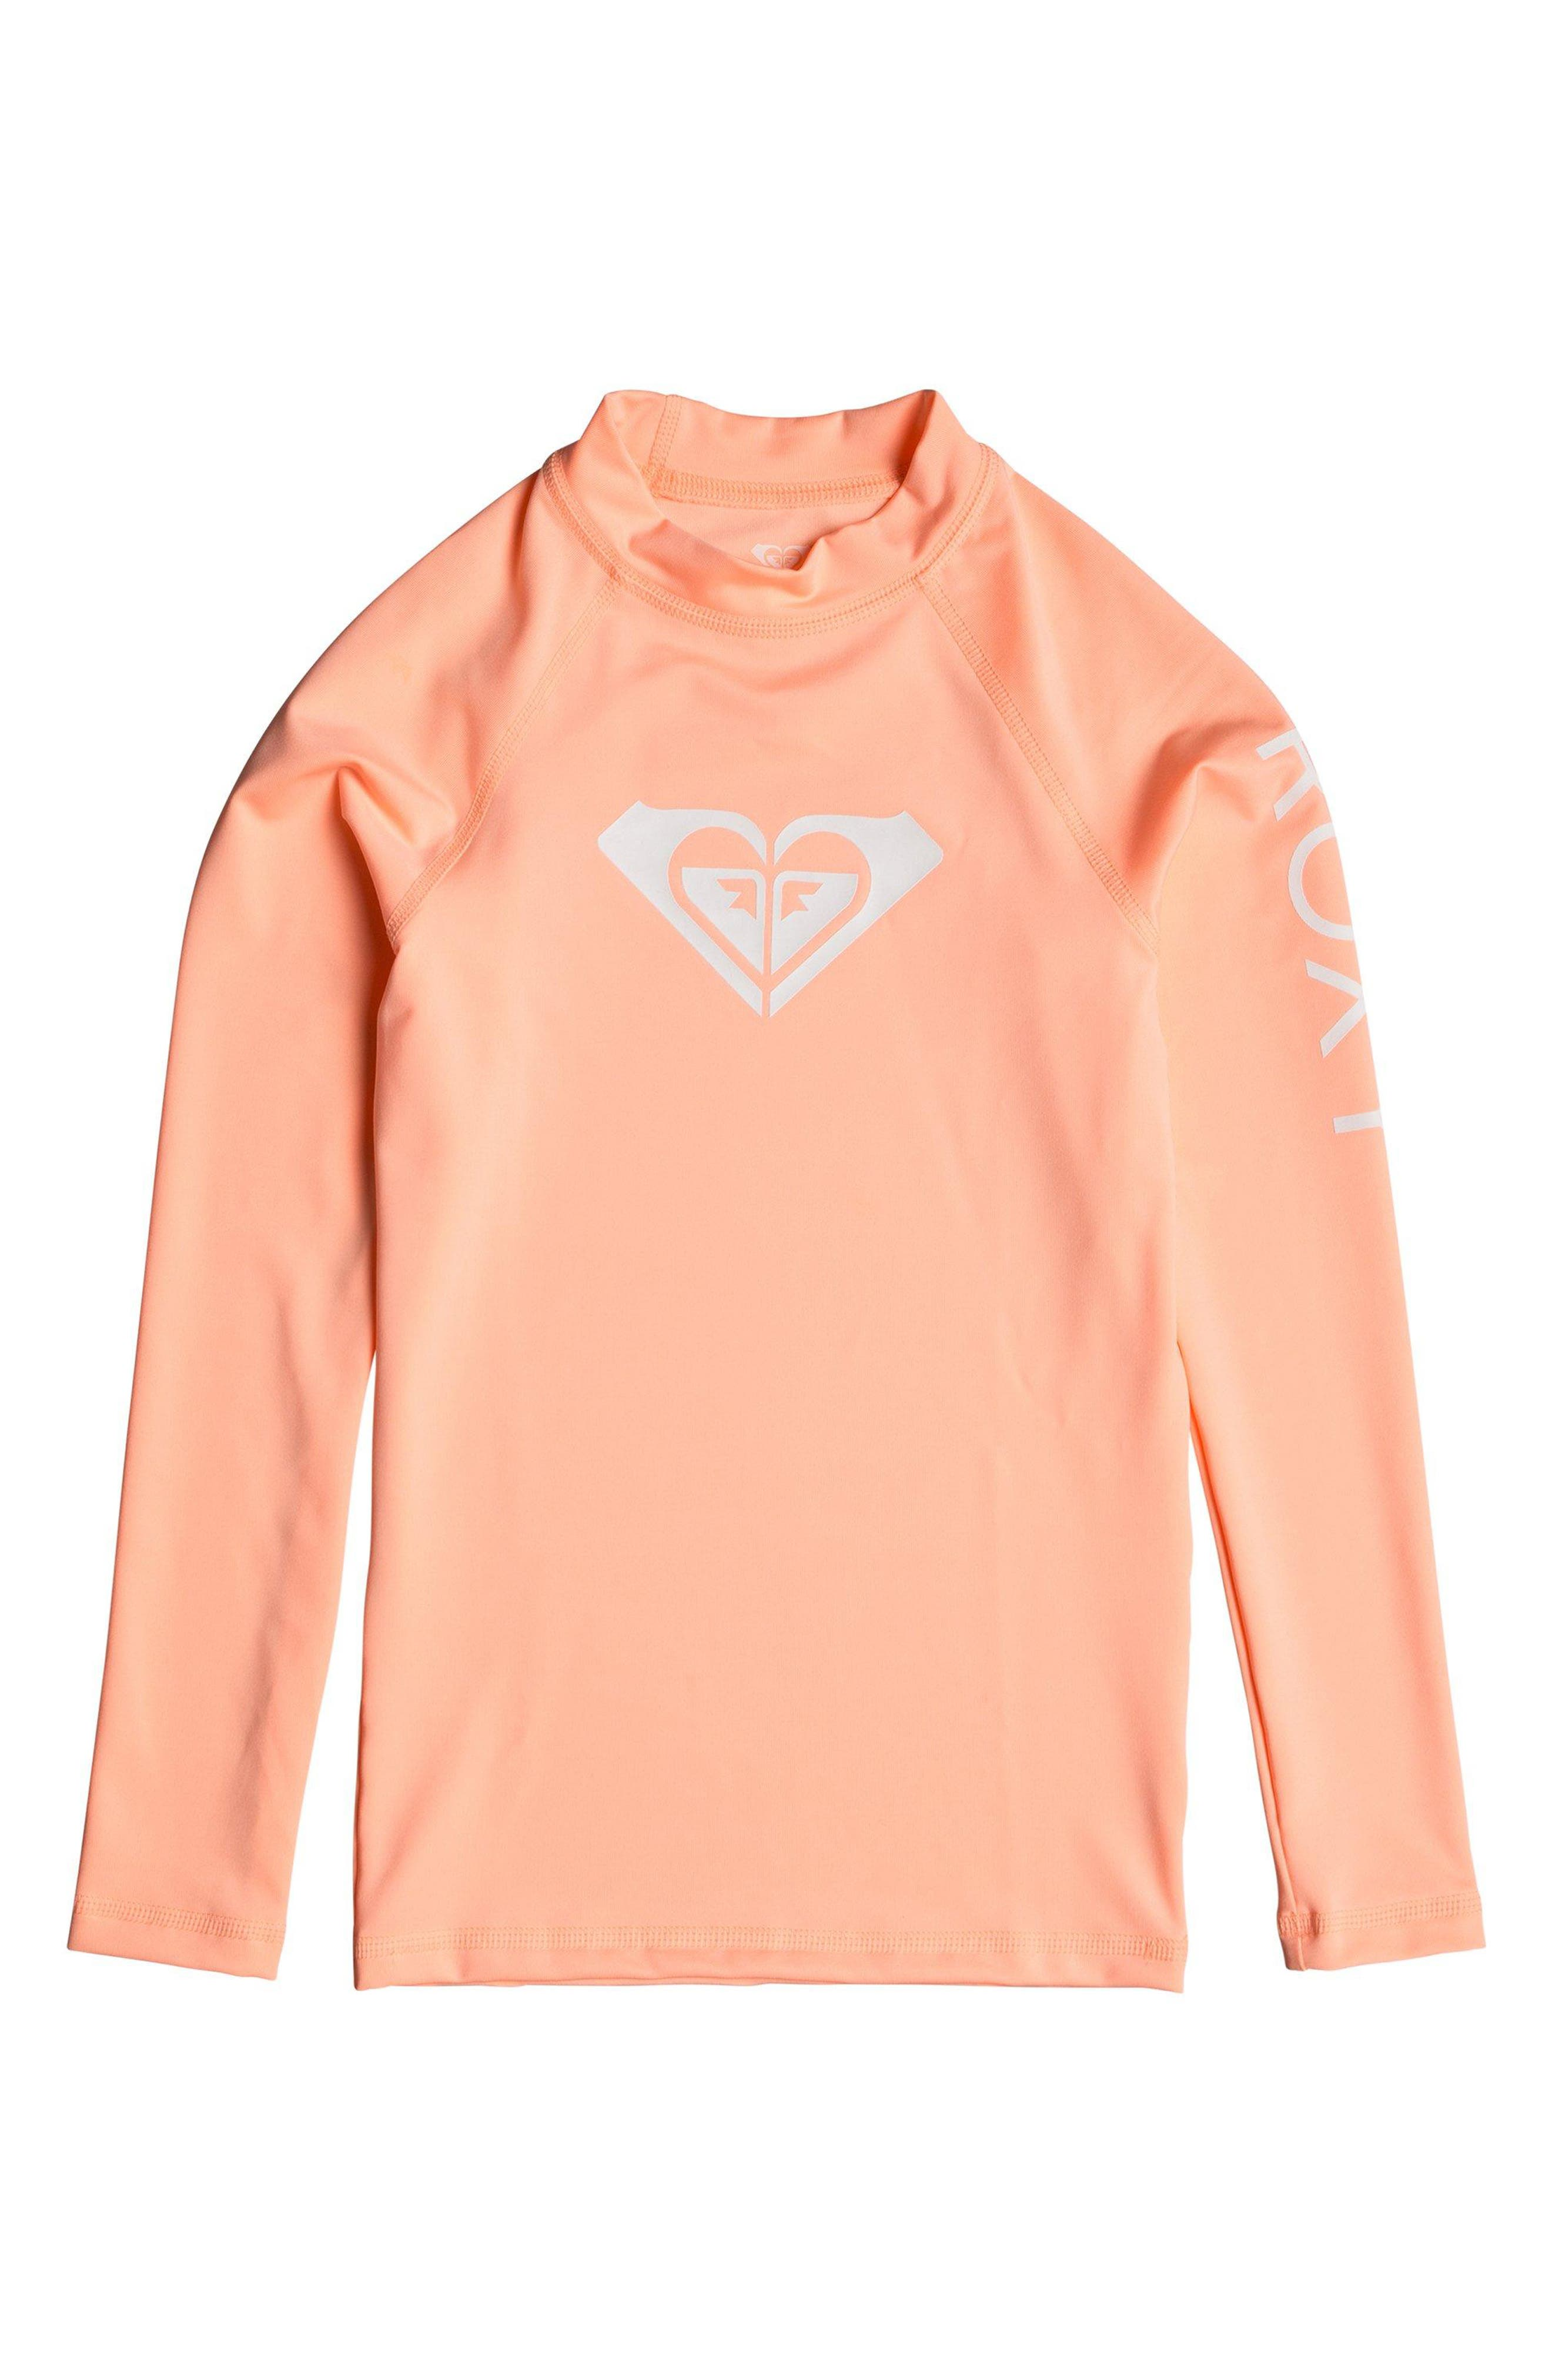 Girls Roxy Whole Hearted Long Sleeve Rashguard Size XL (14)  Pink